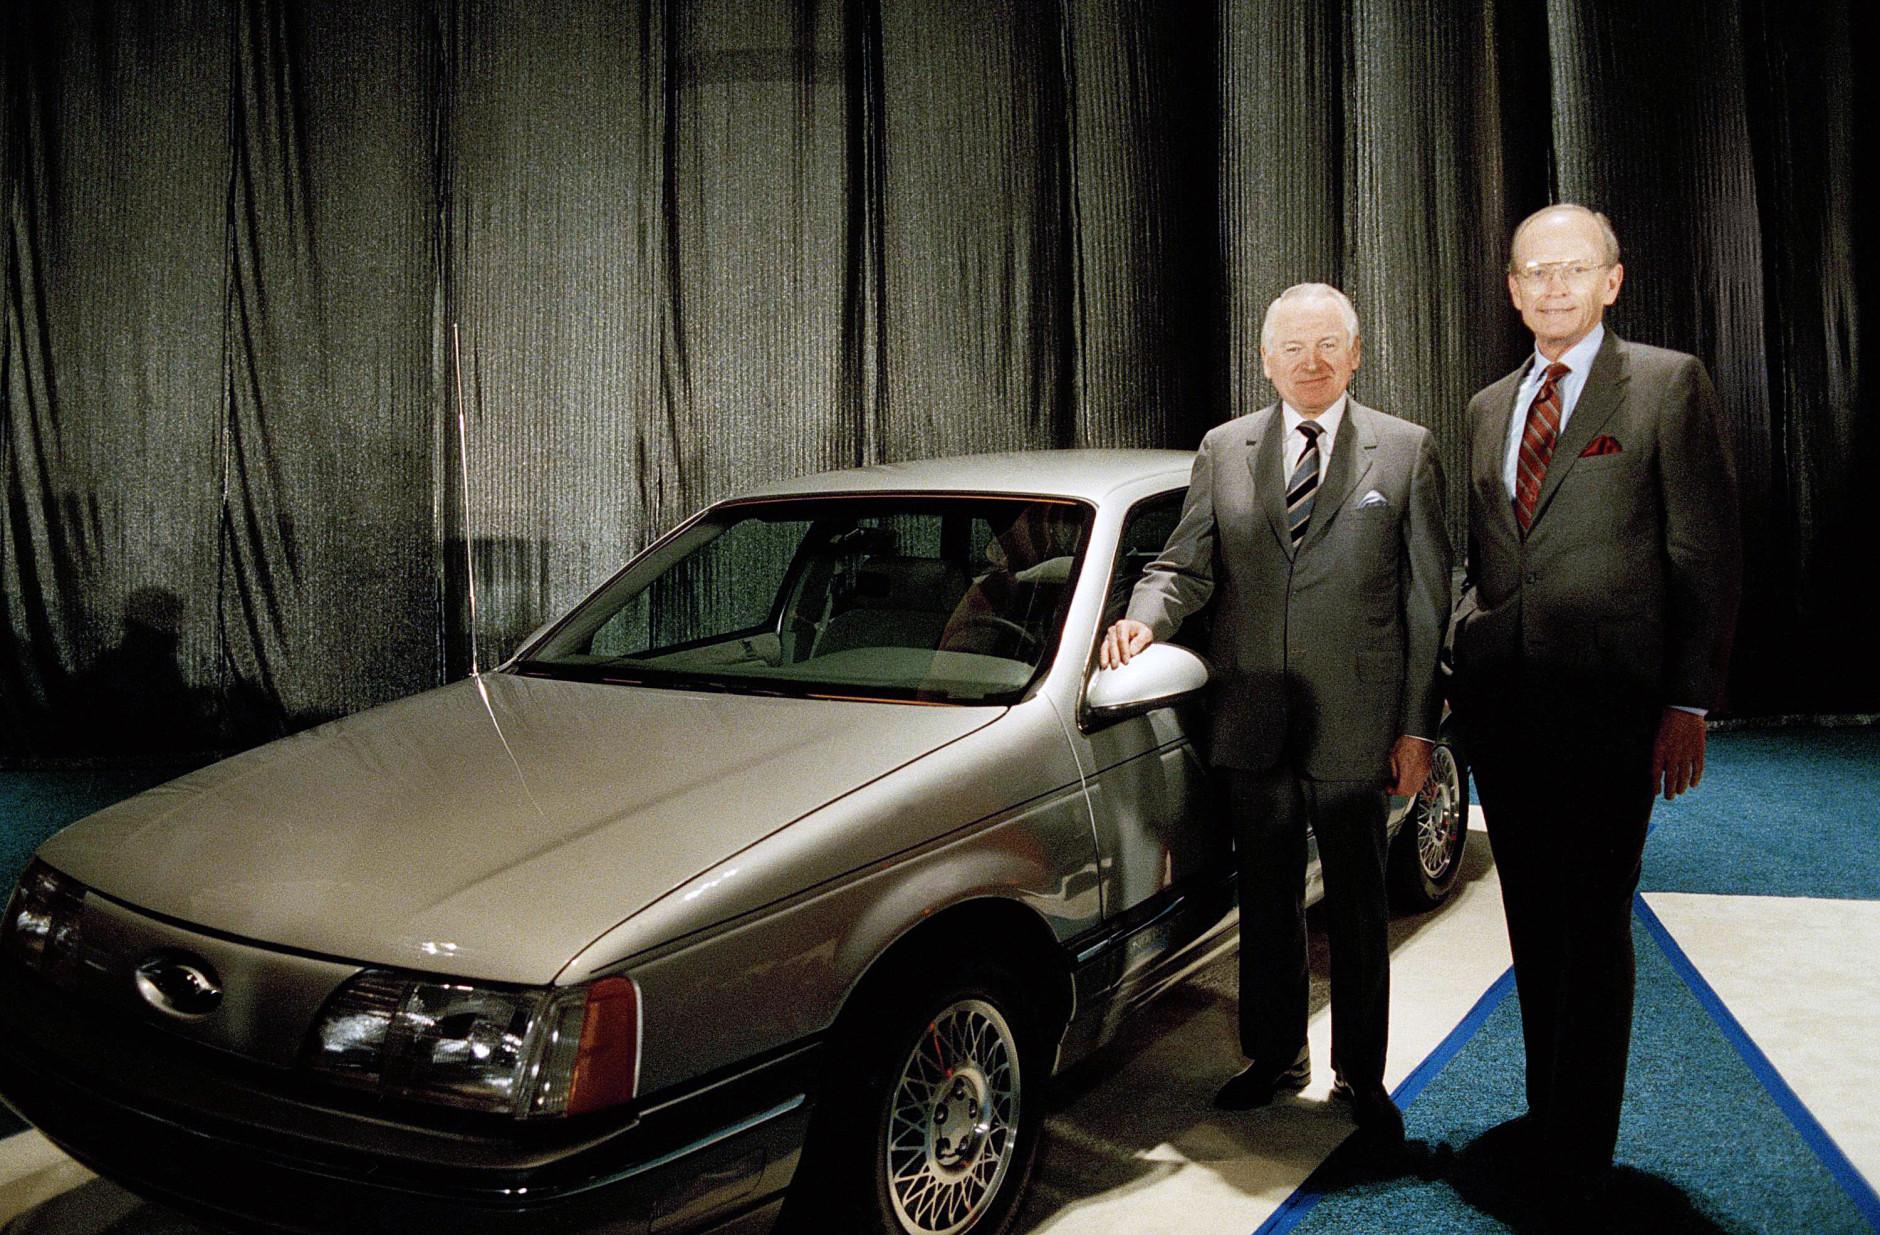 US Ford: TAURUS 1985(AP Photo)